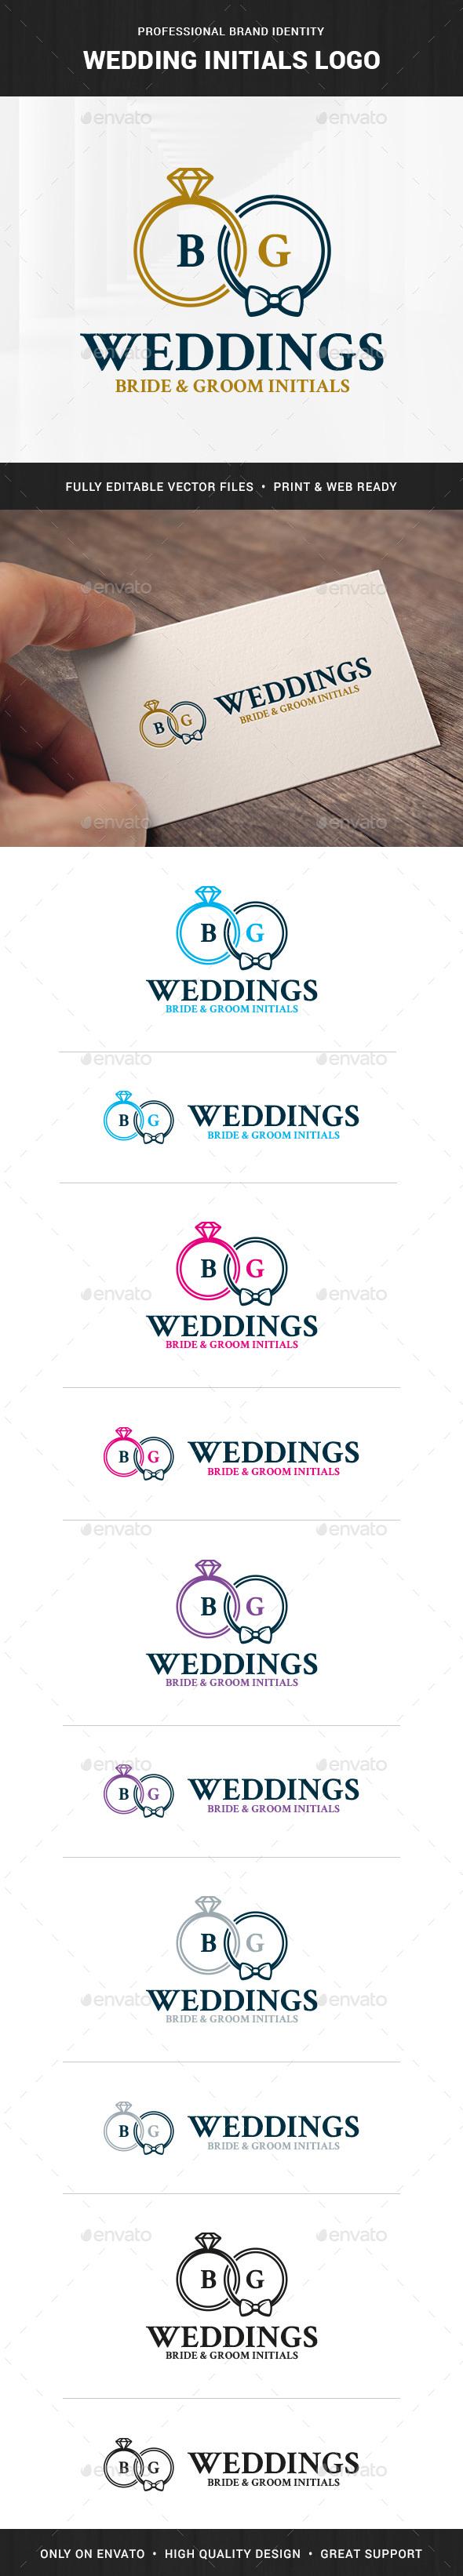 Wedding Initials Logo Template